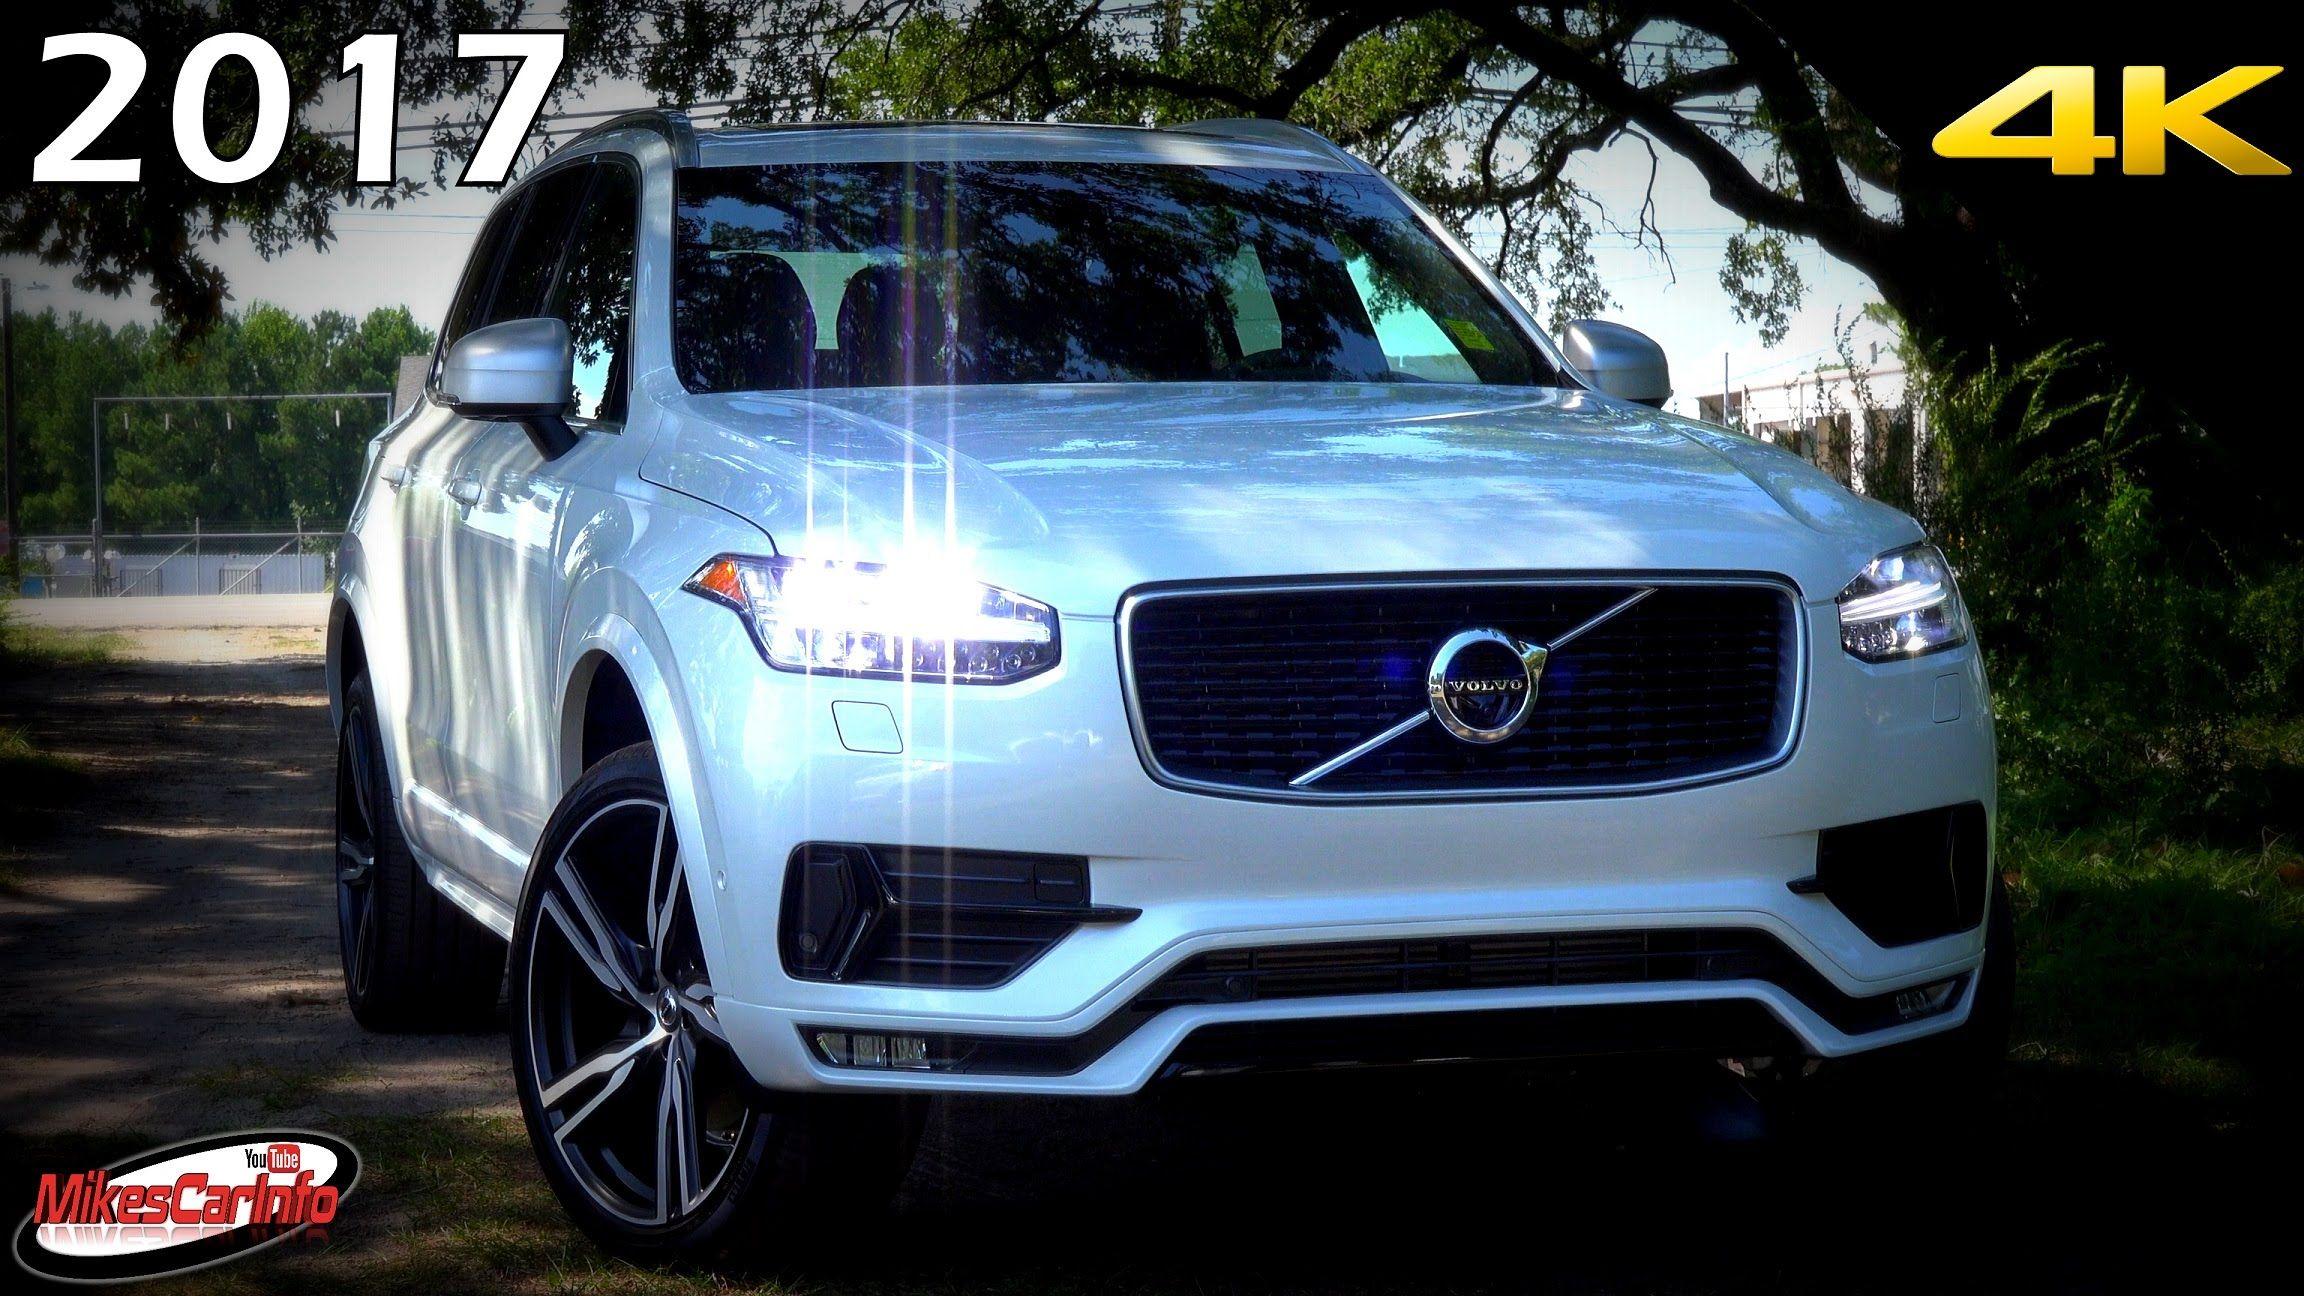 2015 Volvo XC90 details revealed - http://www.caradvice.com.au/303866/2015- volvo-xc90-details-revealed/ | What is going on? | Pinterest | Volvo, Volvo  xc90 ...